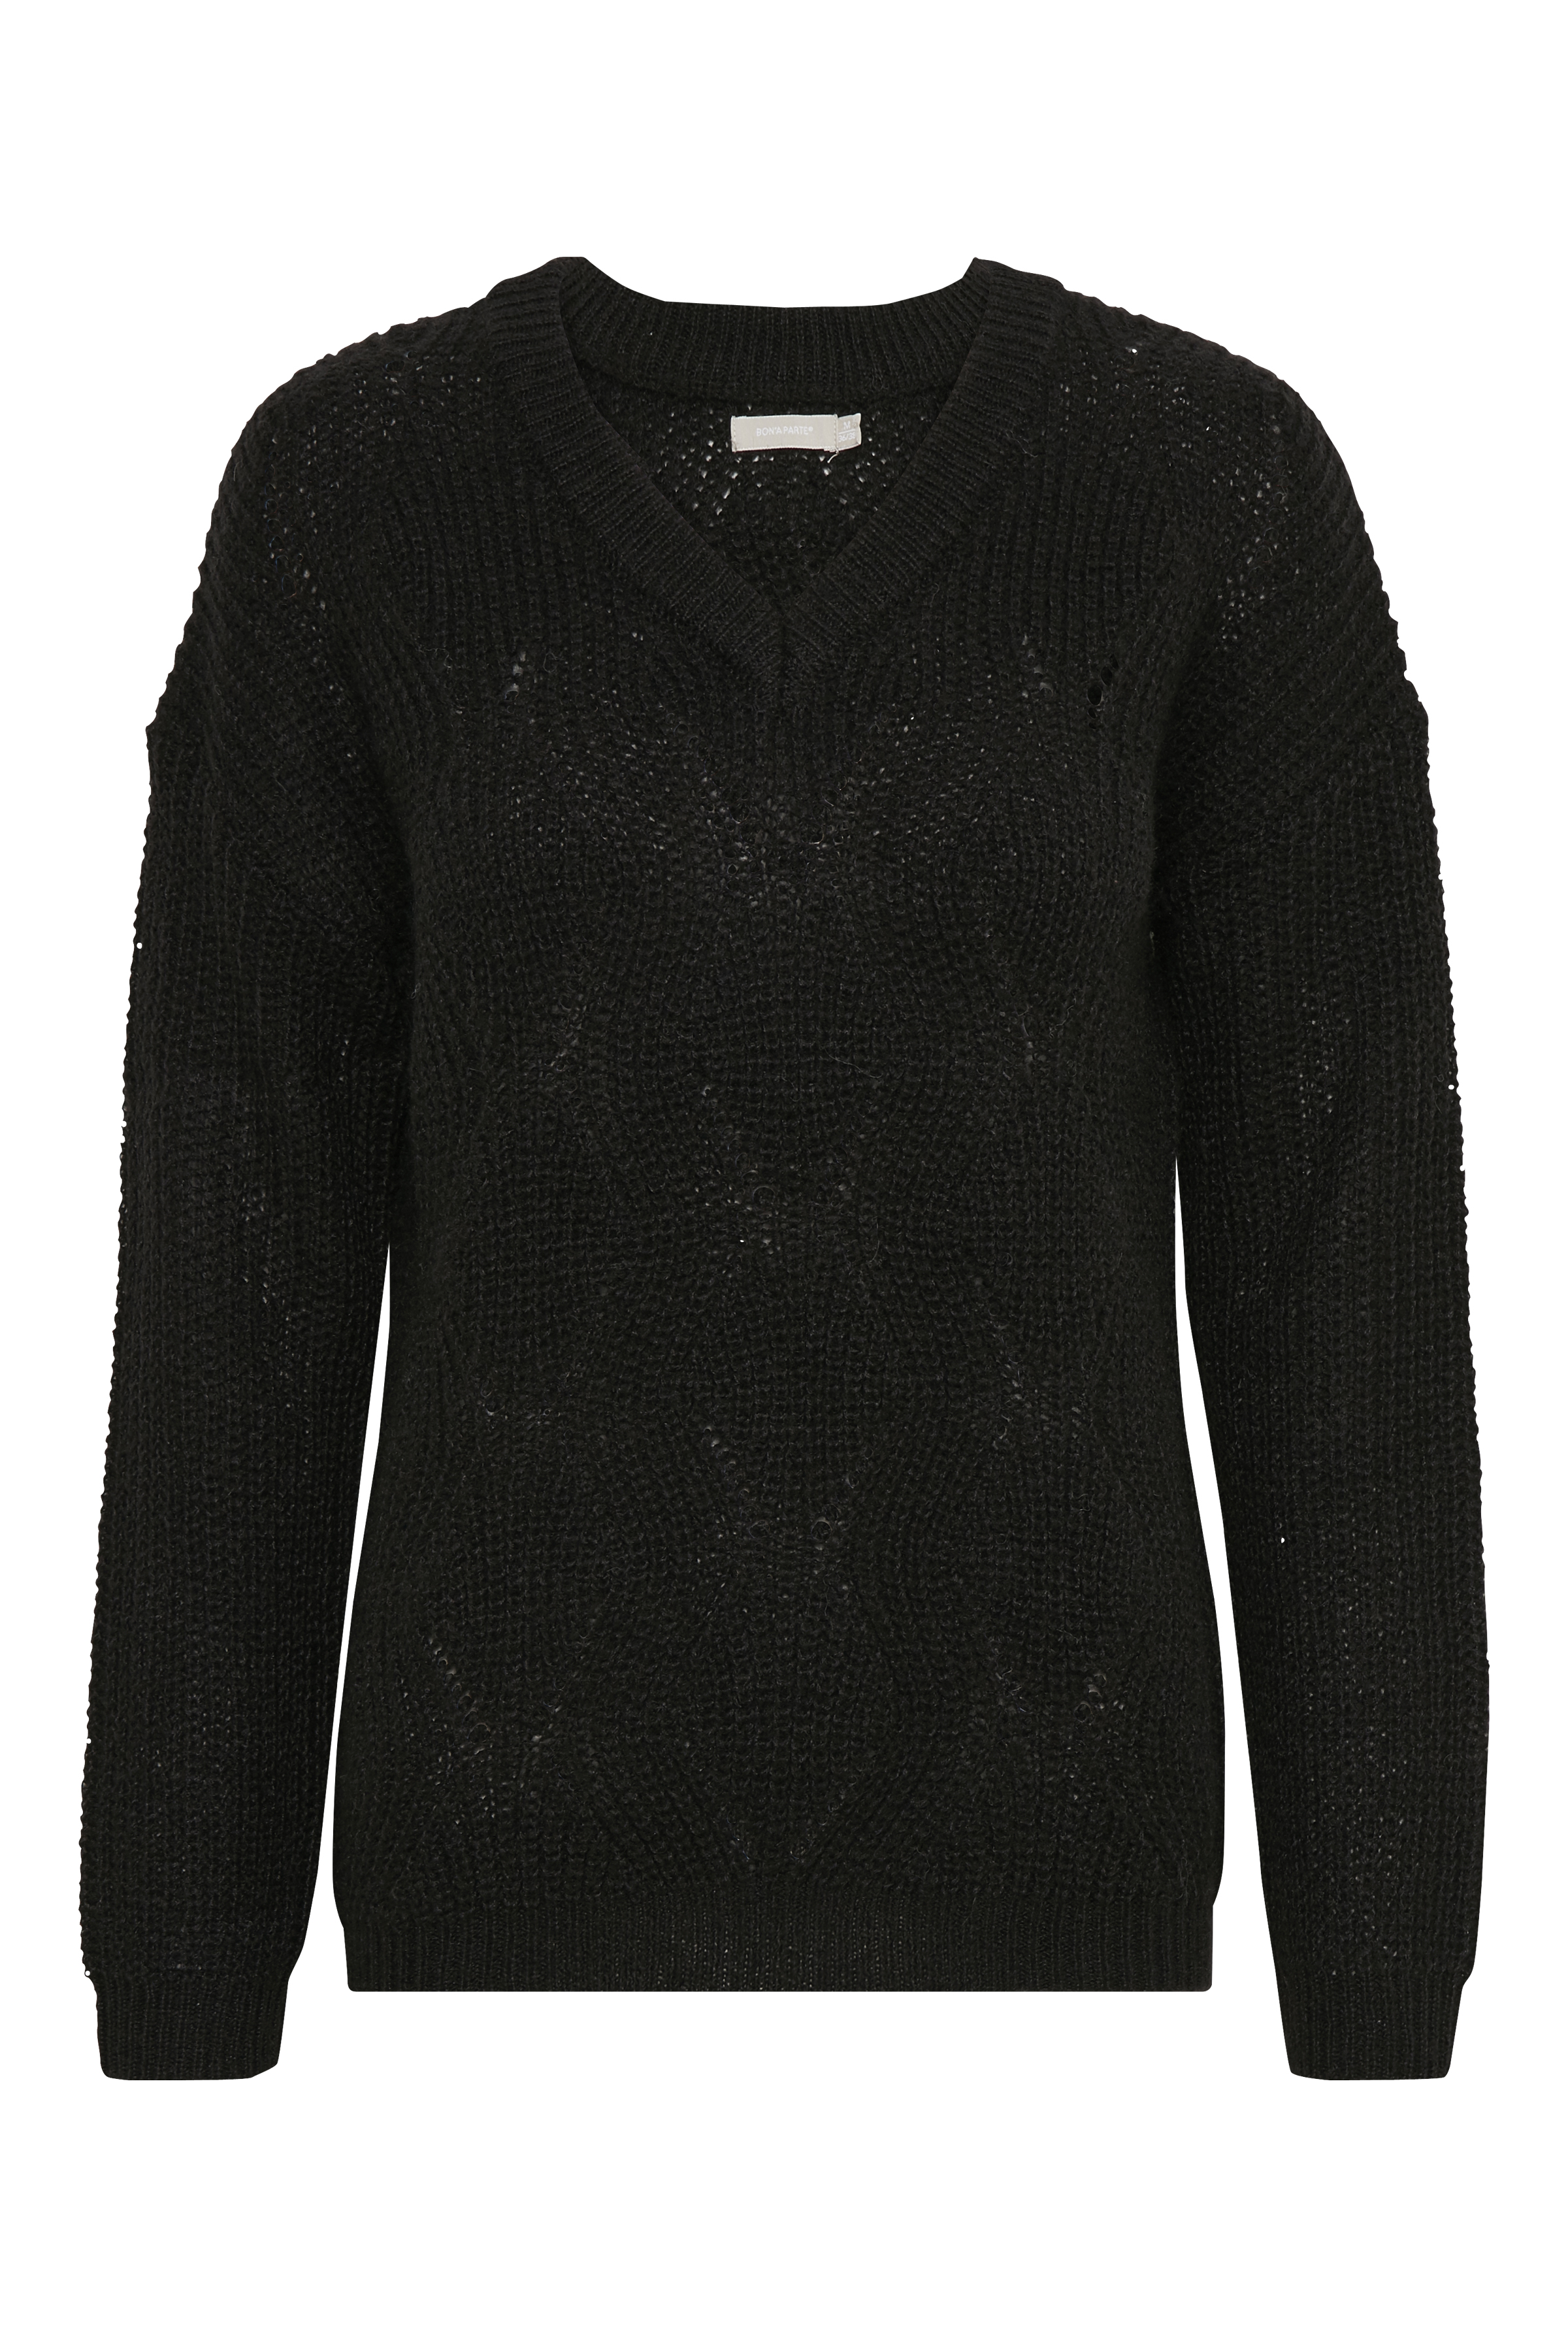 Bon'A Parte Dame Gebreide pullover - Zwart